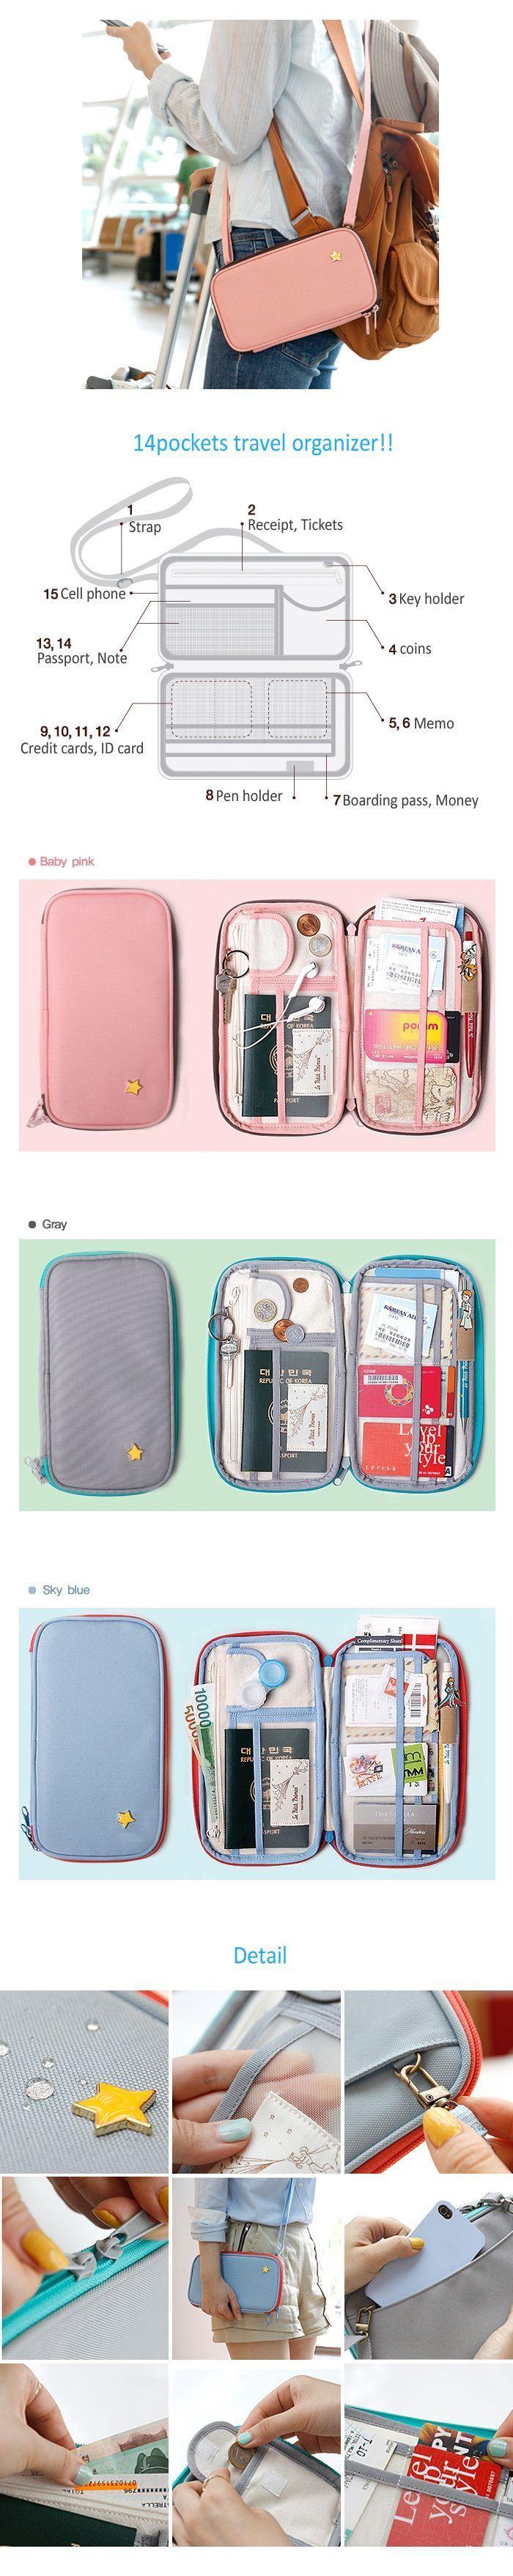 Little Prince B612 Travel Organizer Bag with Strap Passport Holder Case Wallet | eBay #Travel #Organize #Bag